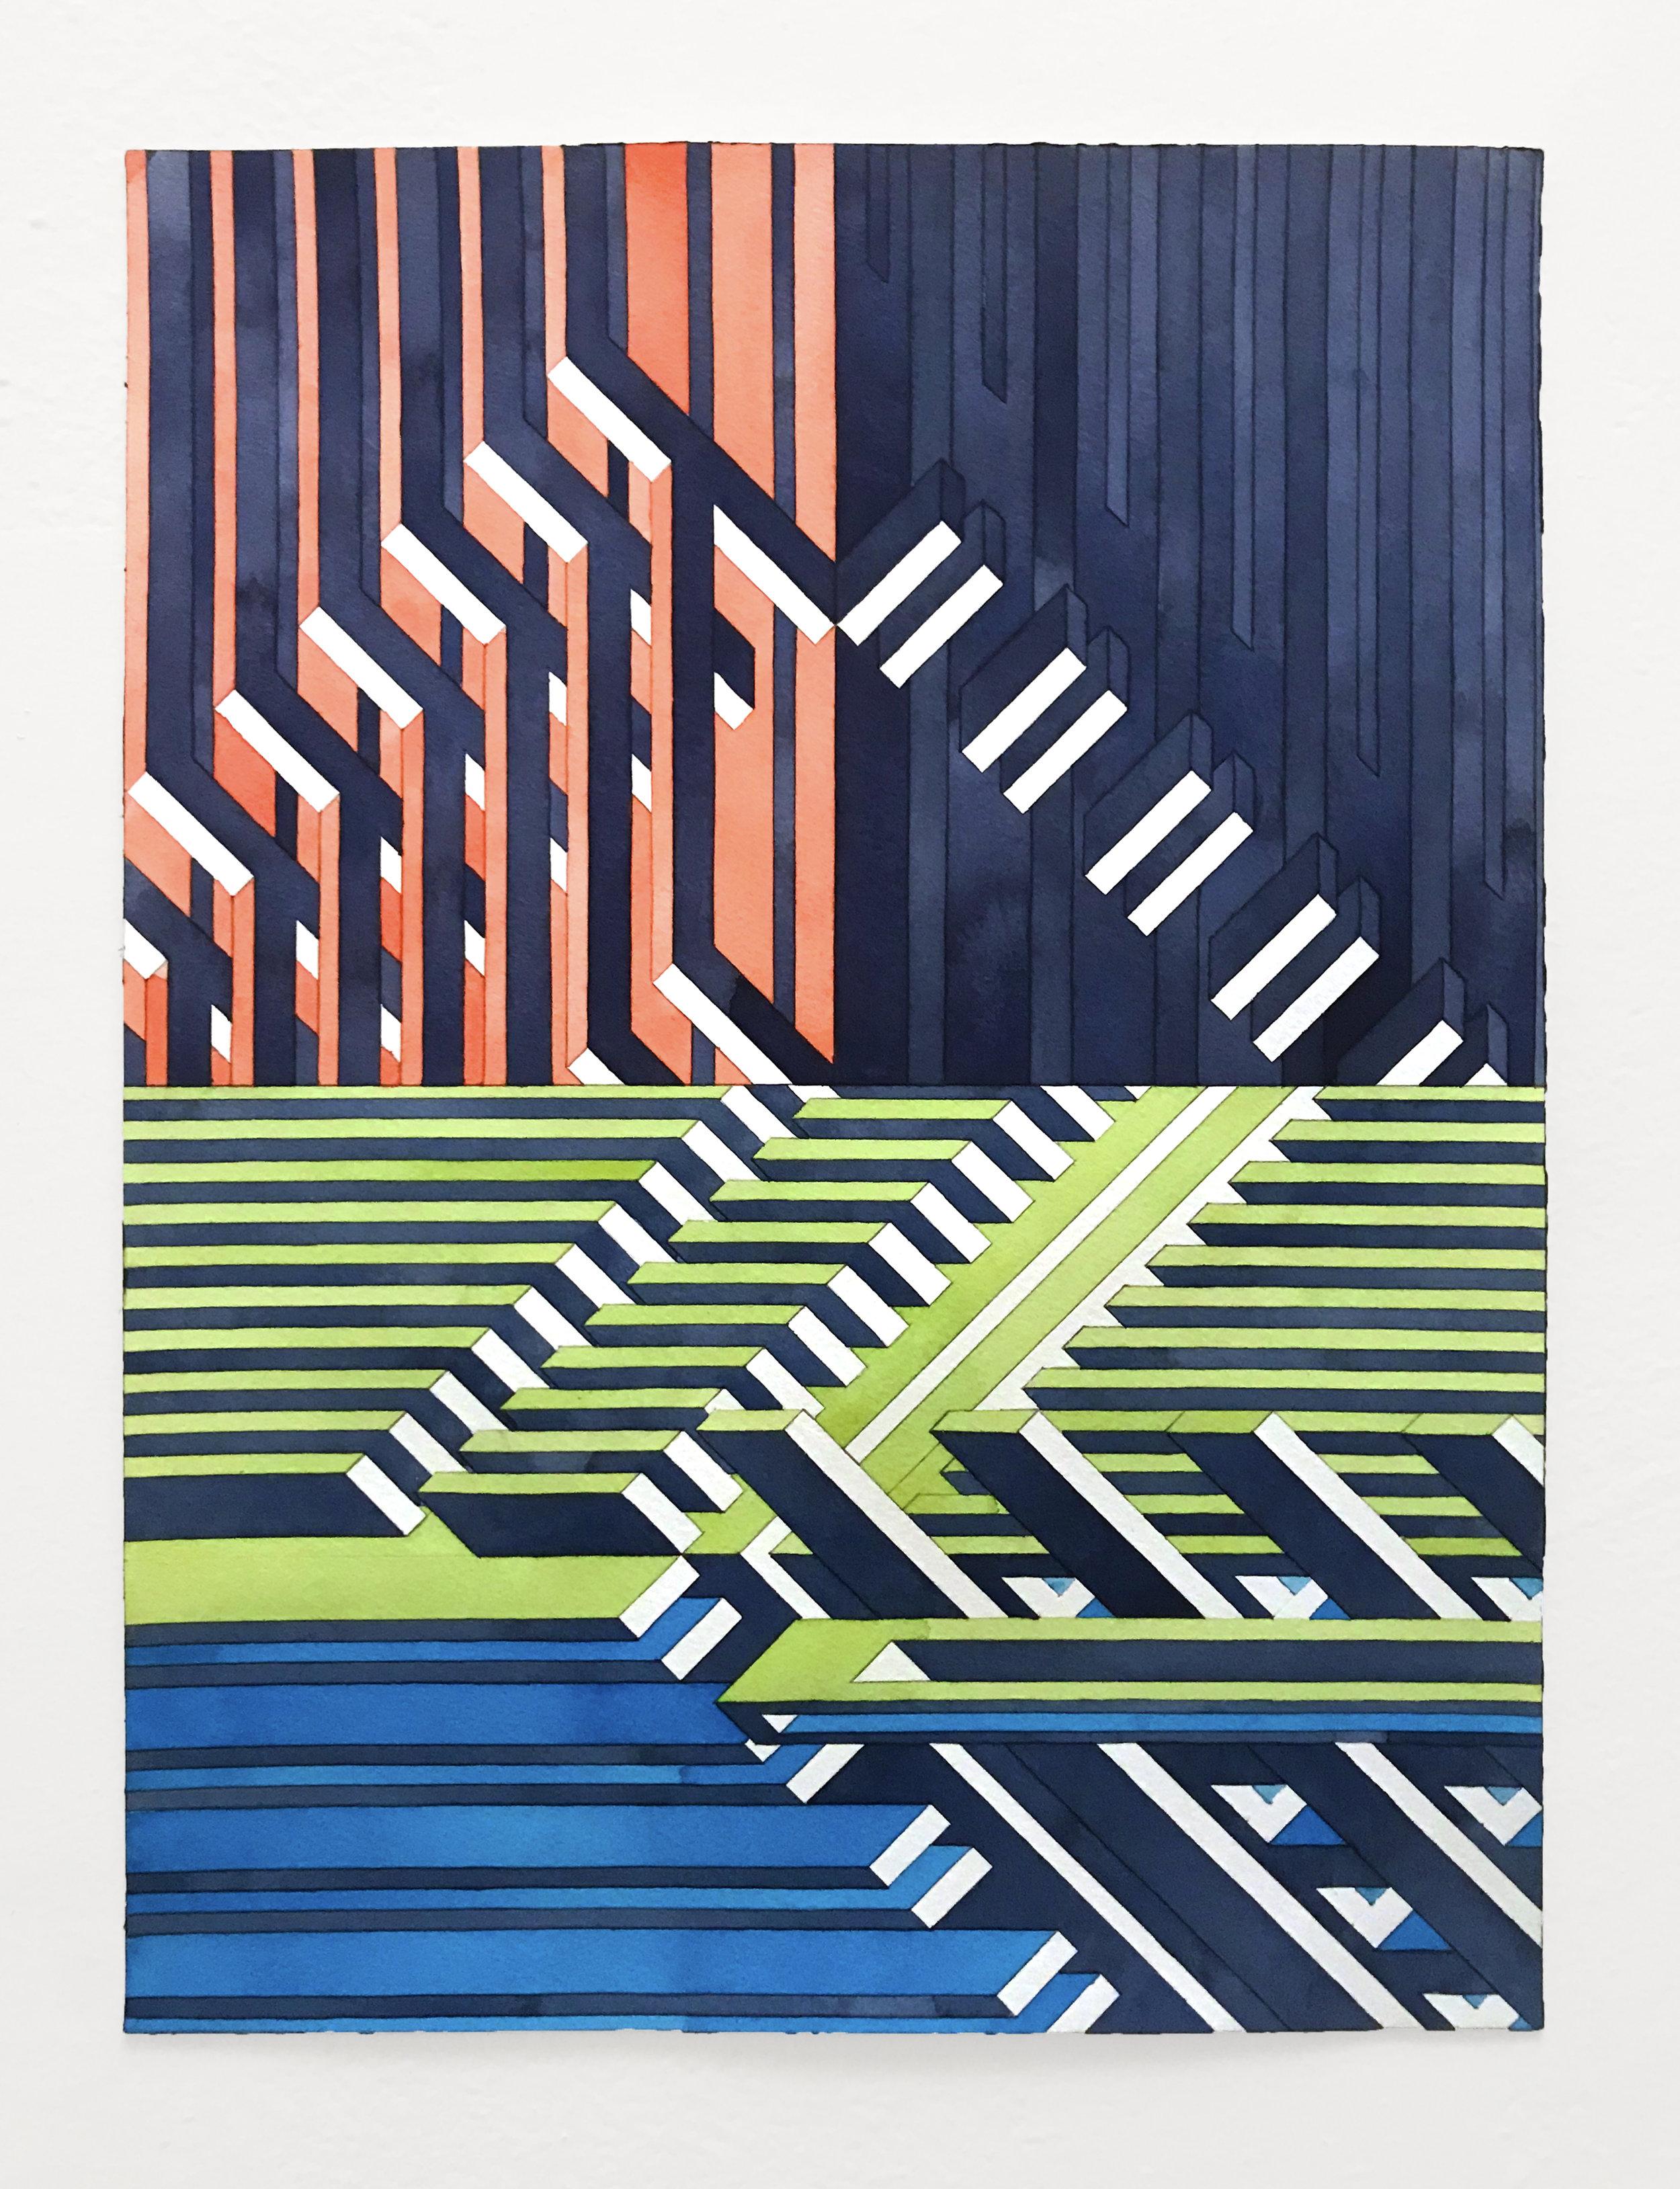 Facility 2, 2019  watercolor graphite on watercolor paper  16 x 12 inches